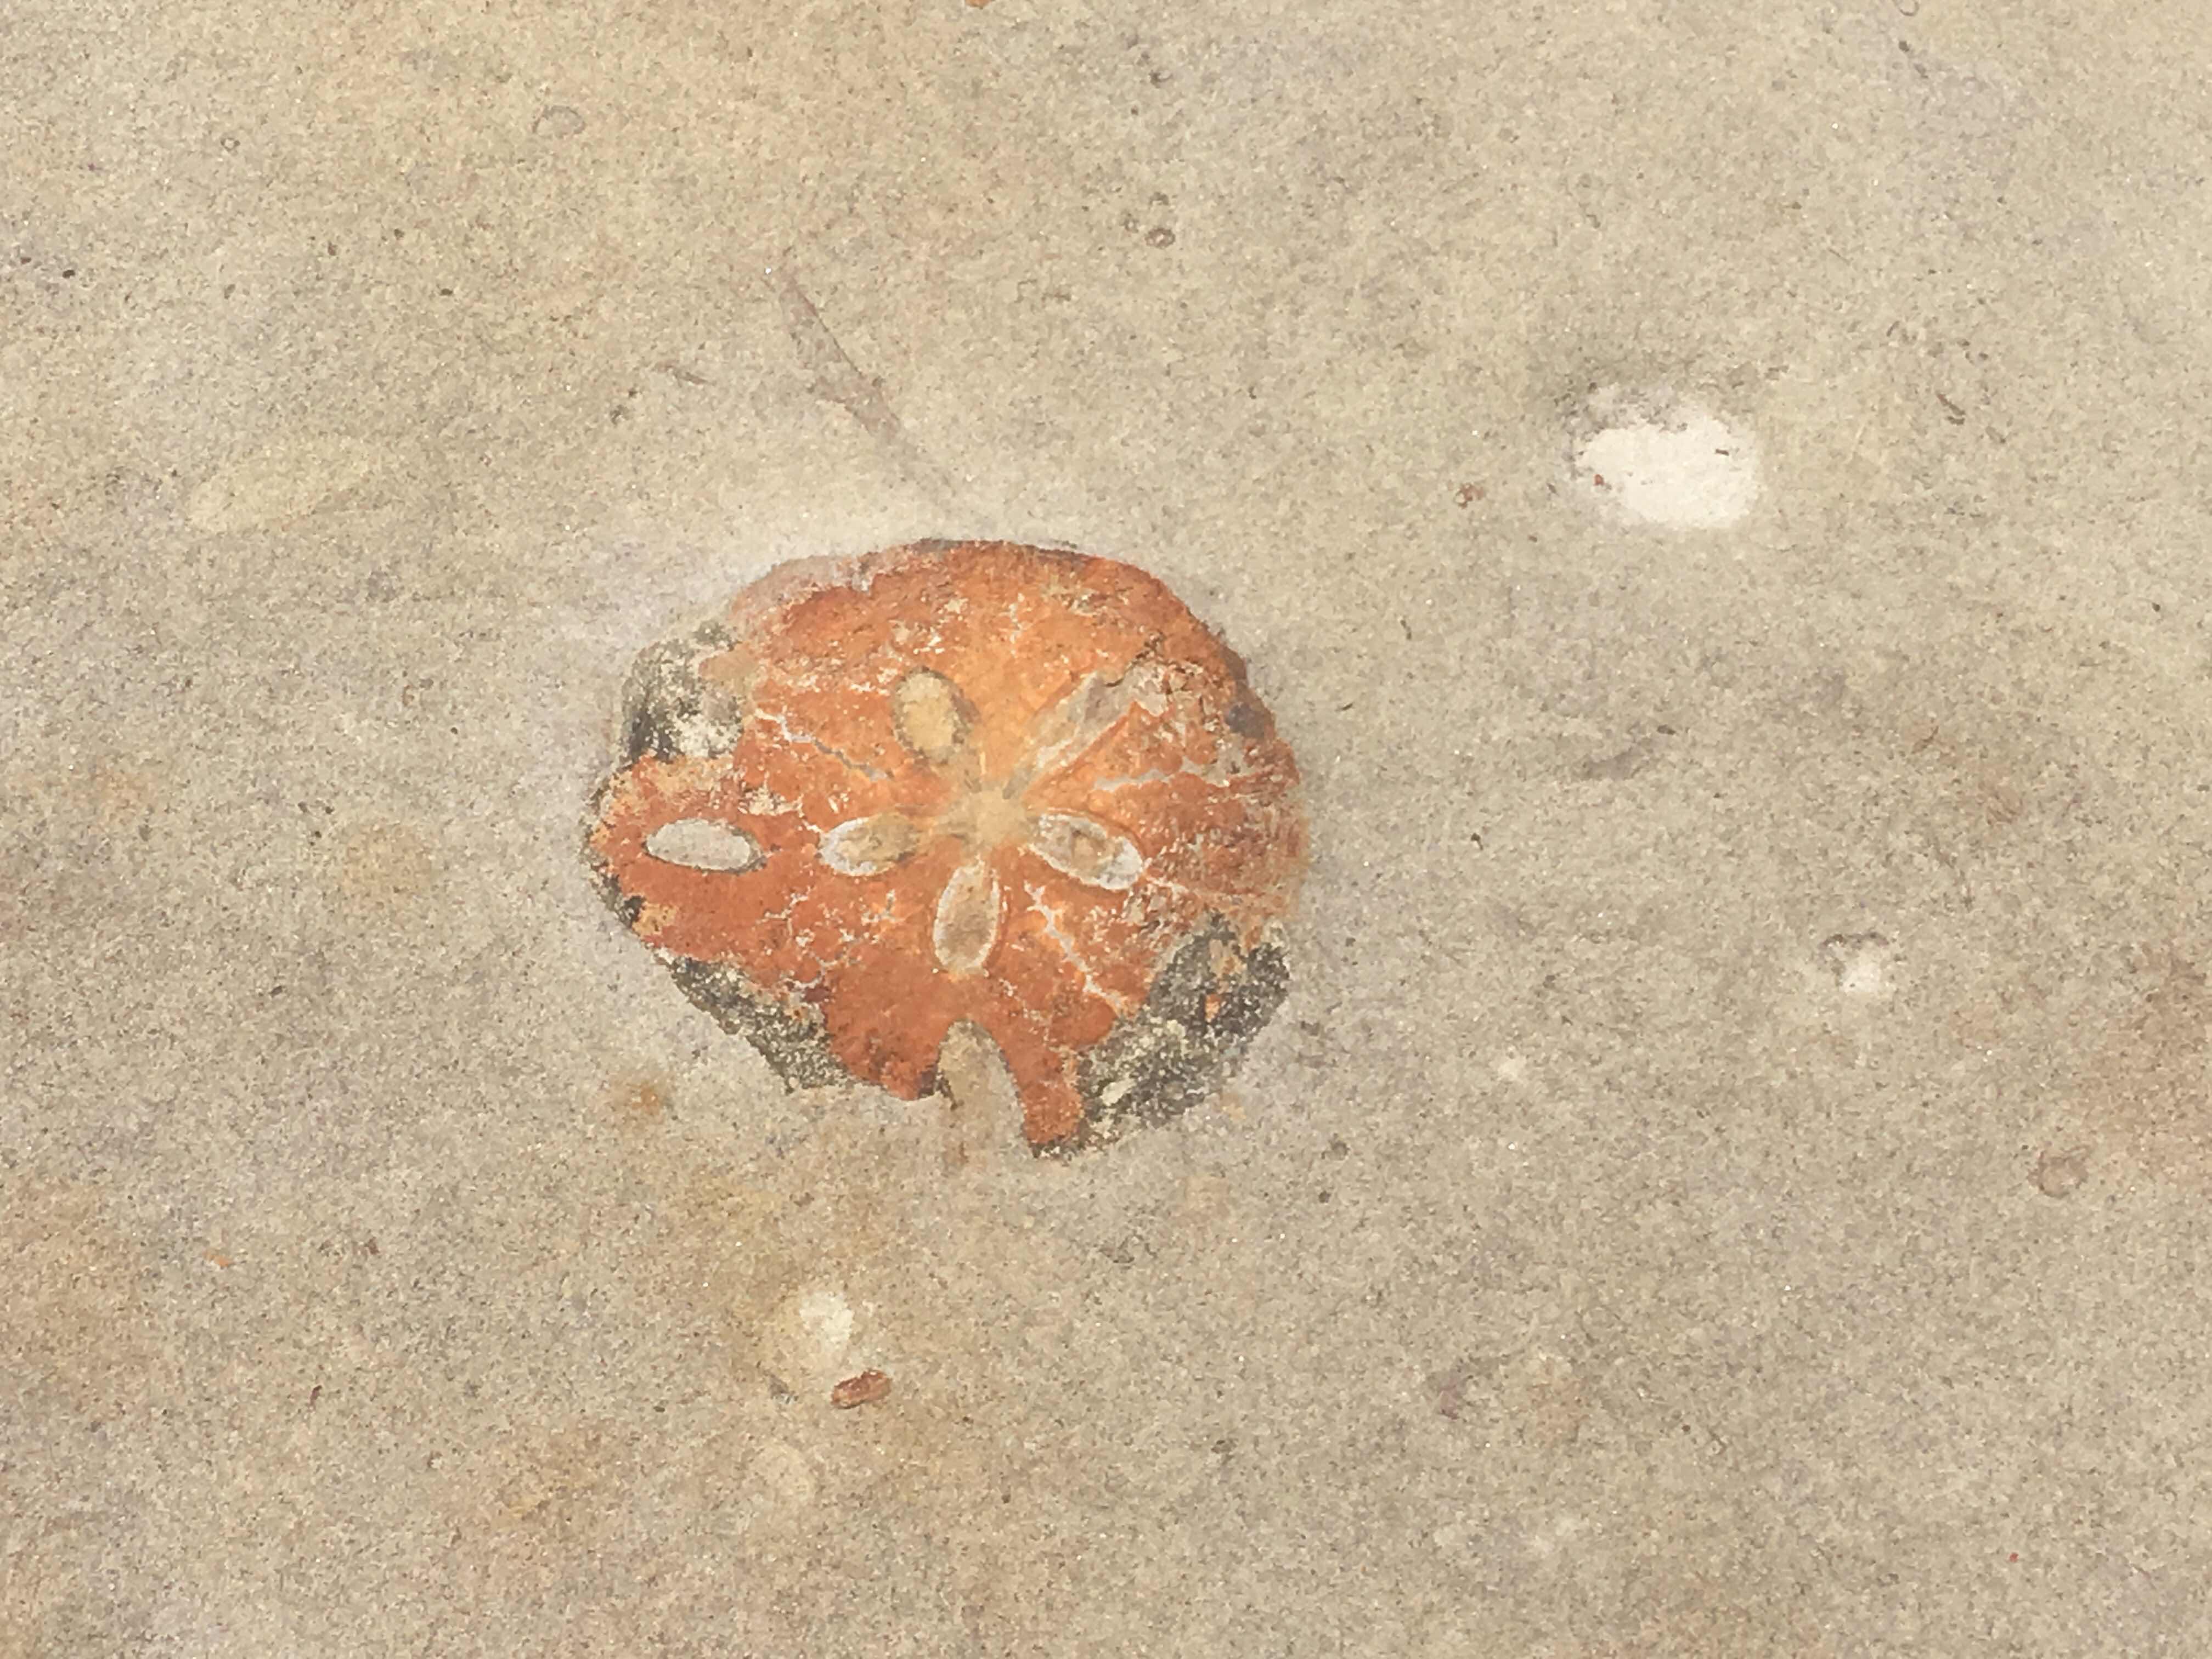 yehliu geopark queen's head yehliu peninsula north coast taipei taiwan fossil